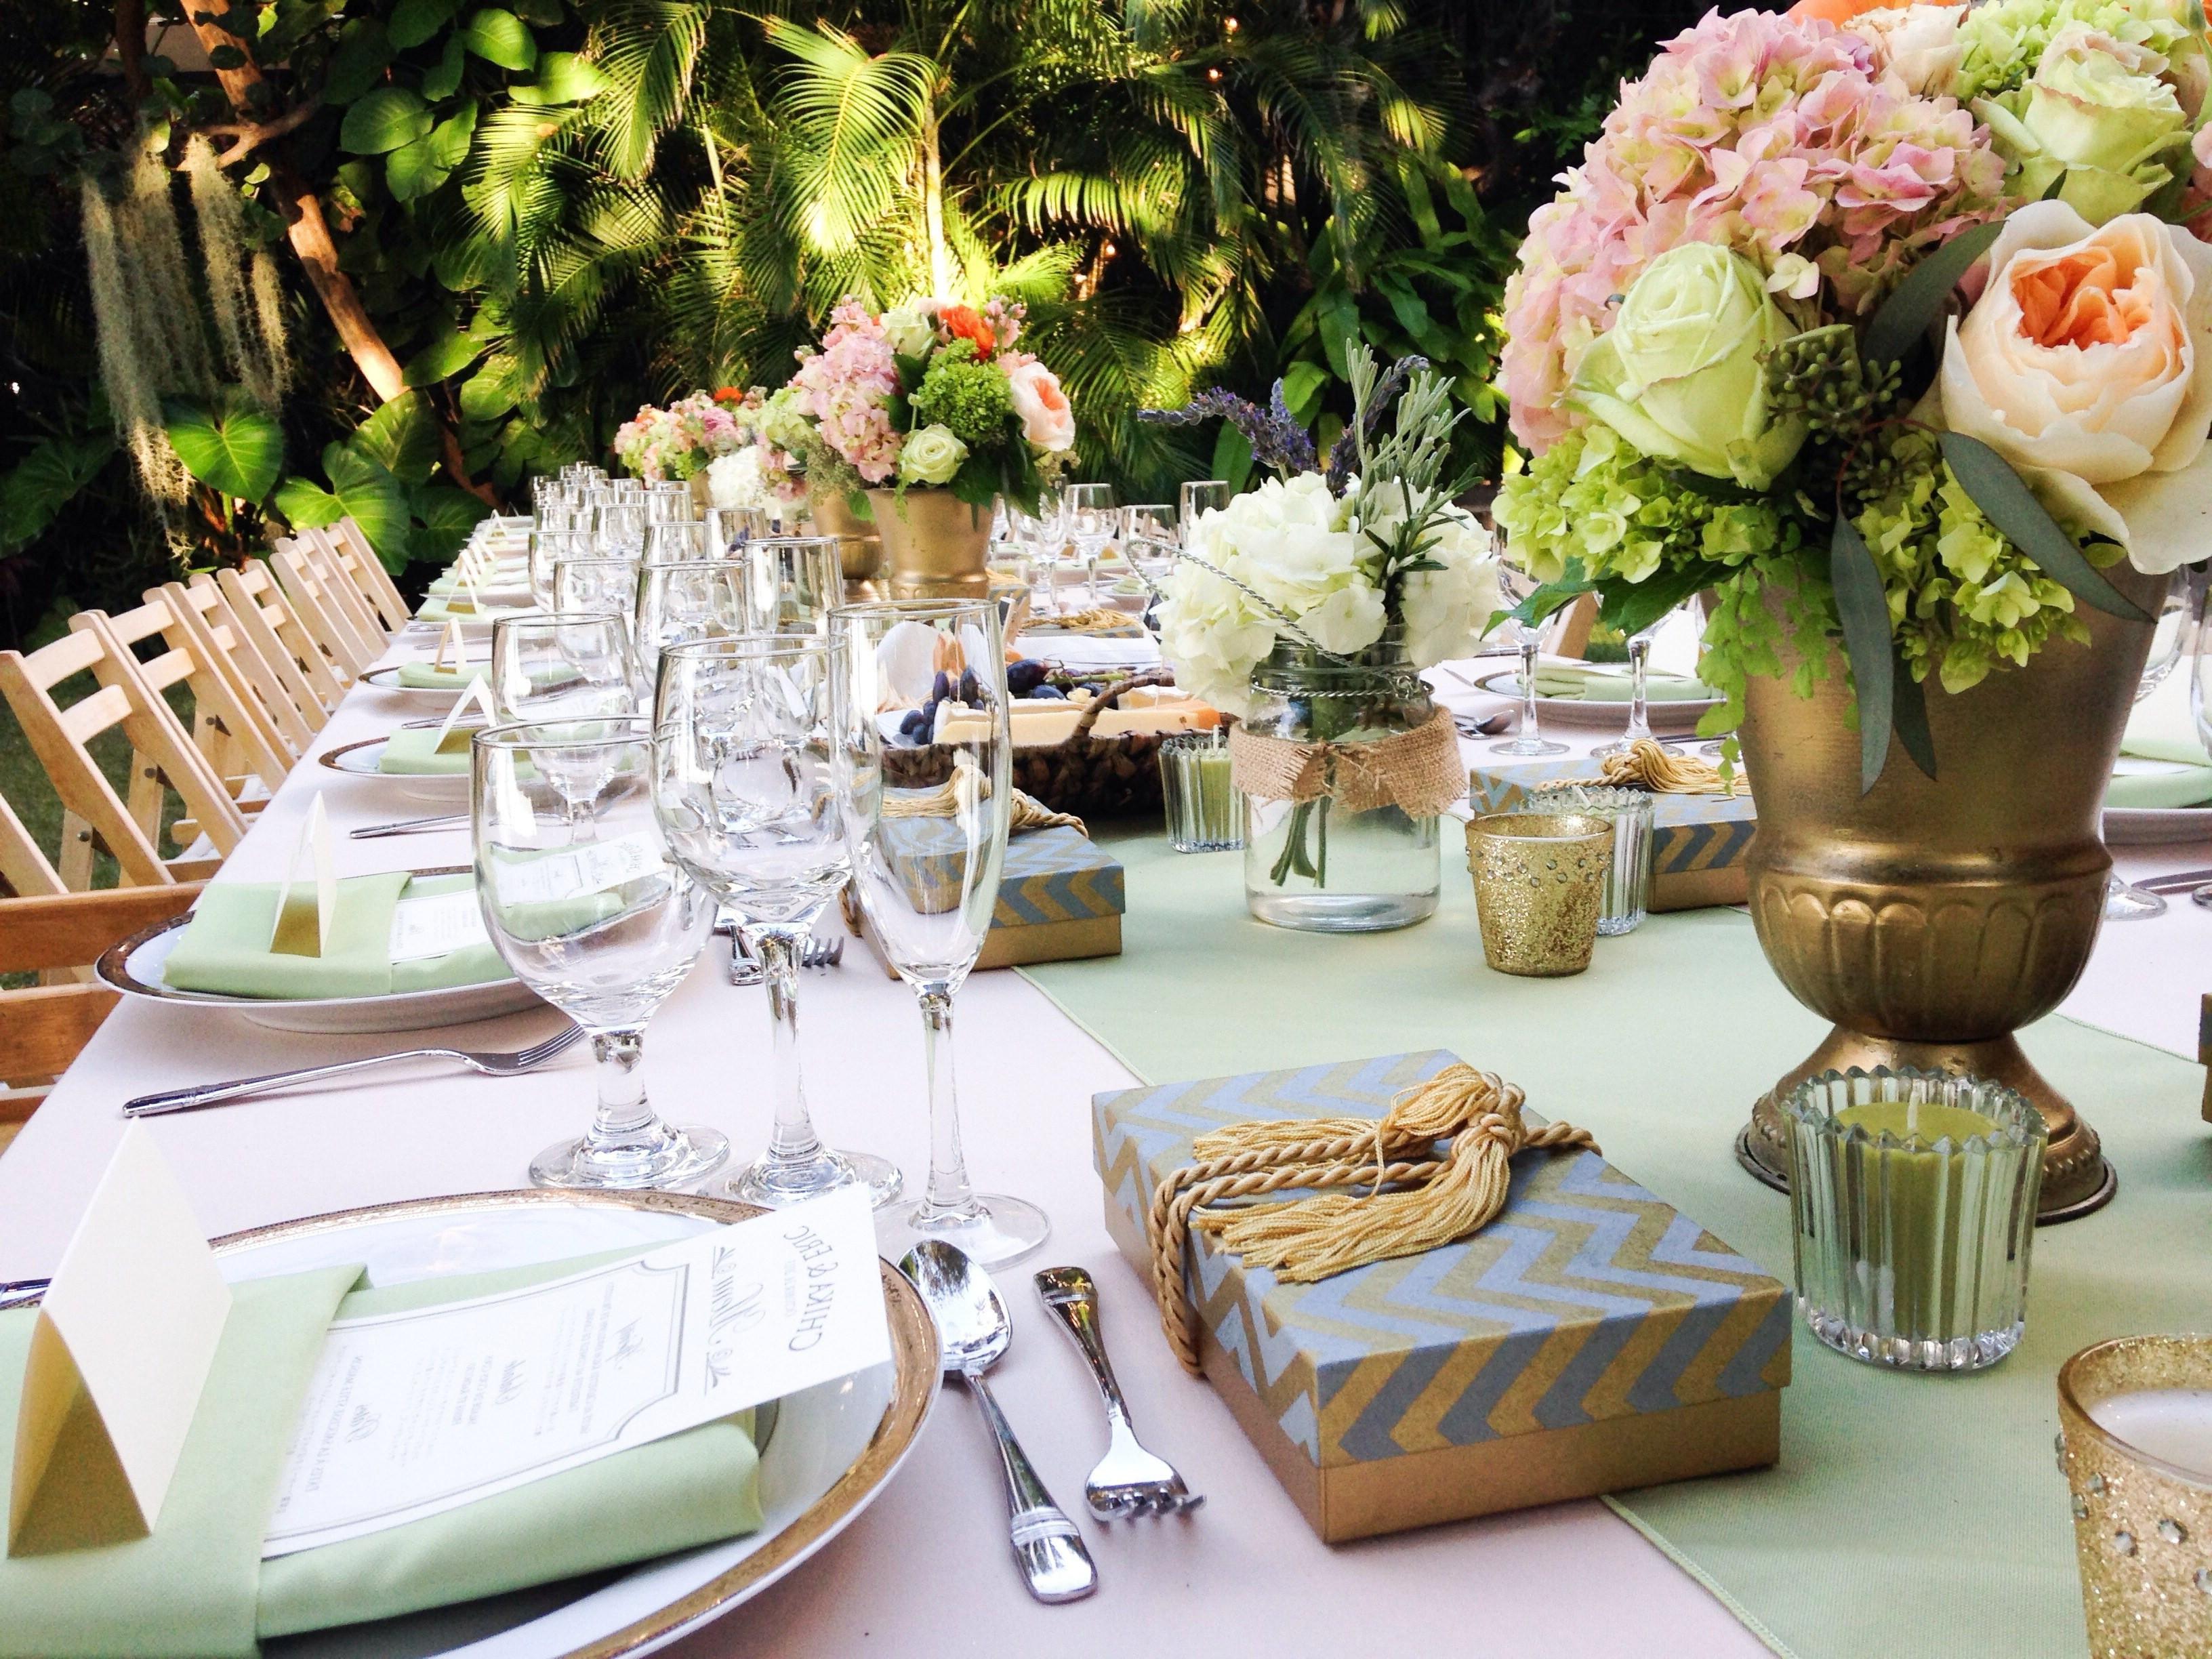 Tropical Wedding Decor Lovely Media Cache Ec0 Pinimg originals Aa 0d 90 Inspiration Tropical Wedding